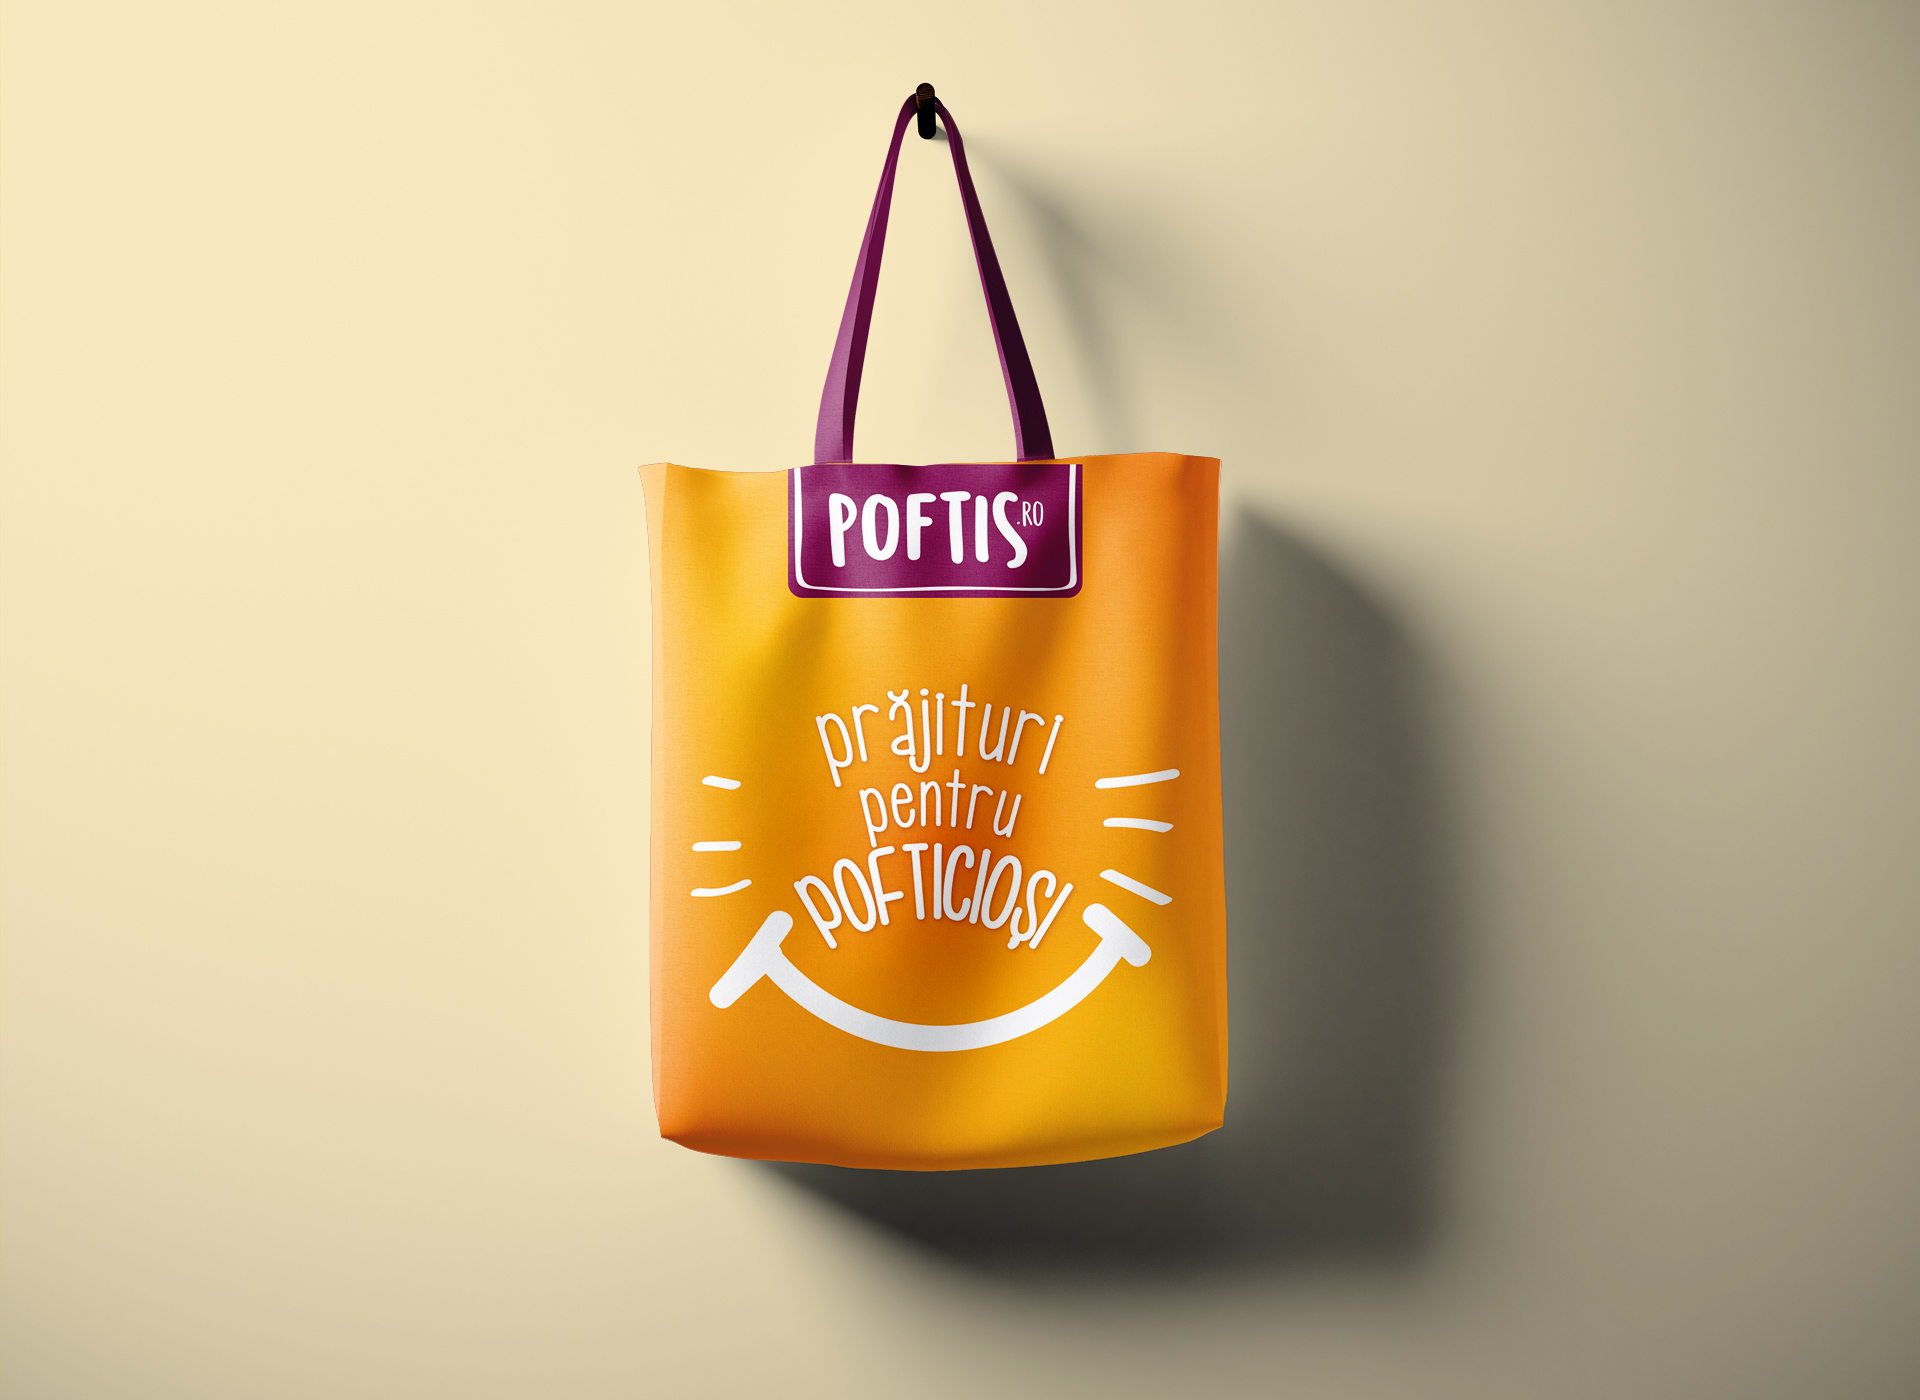 poftis bag branding inoveo